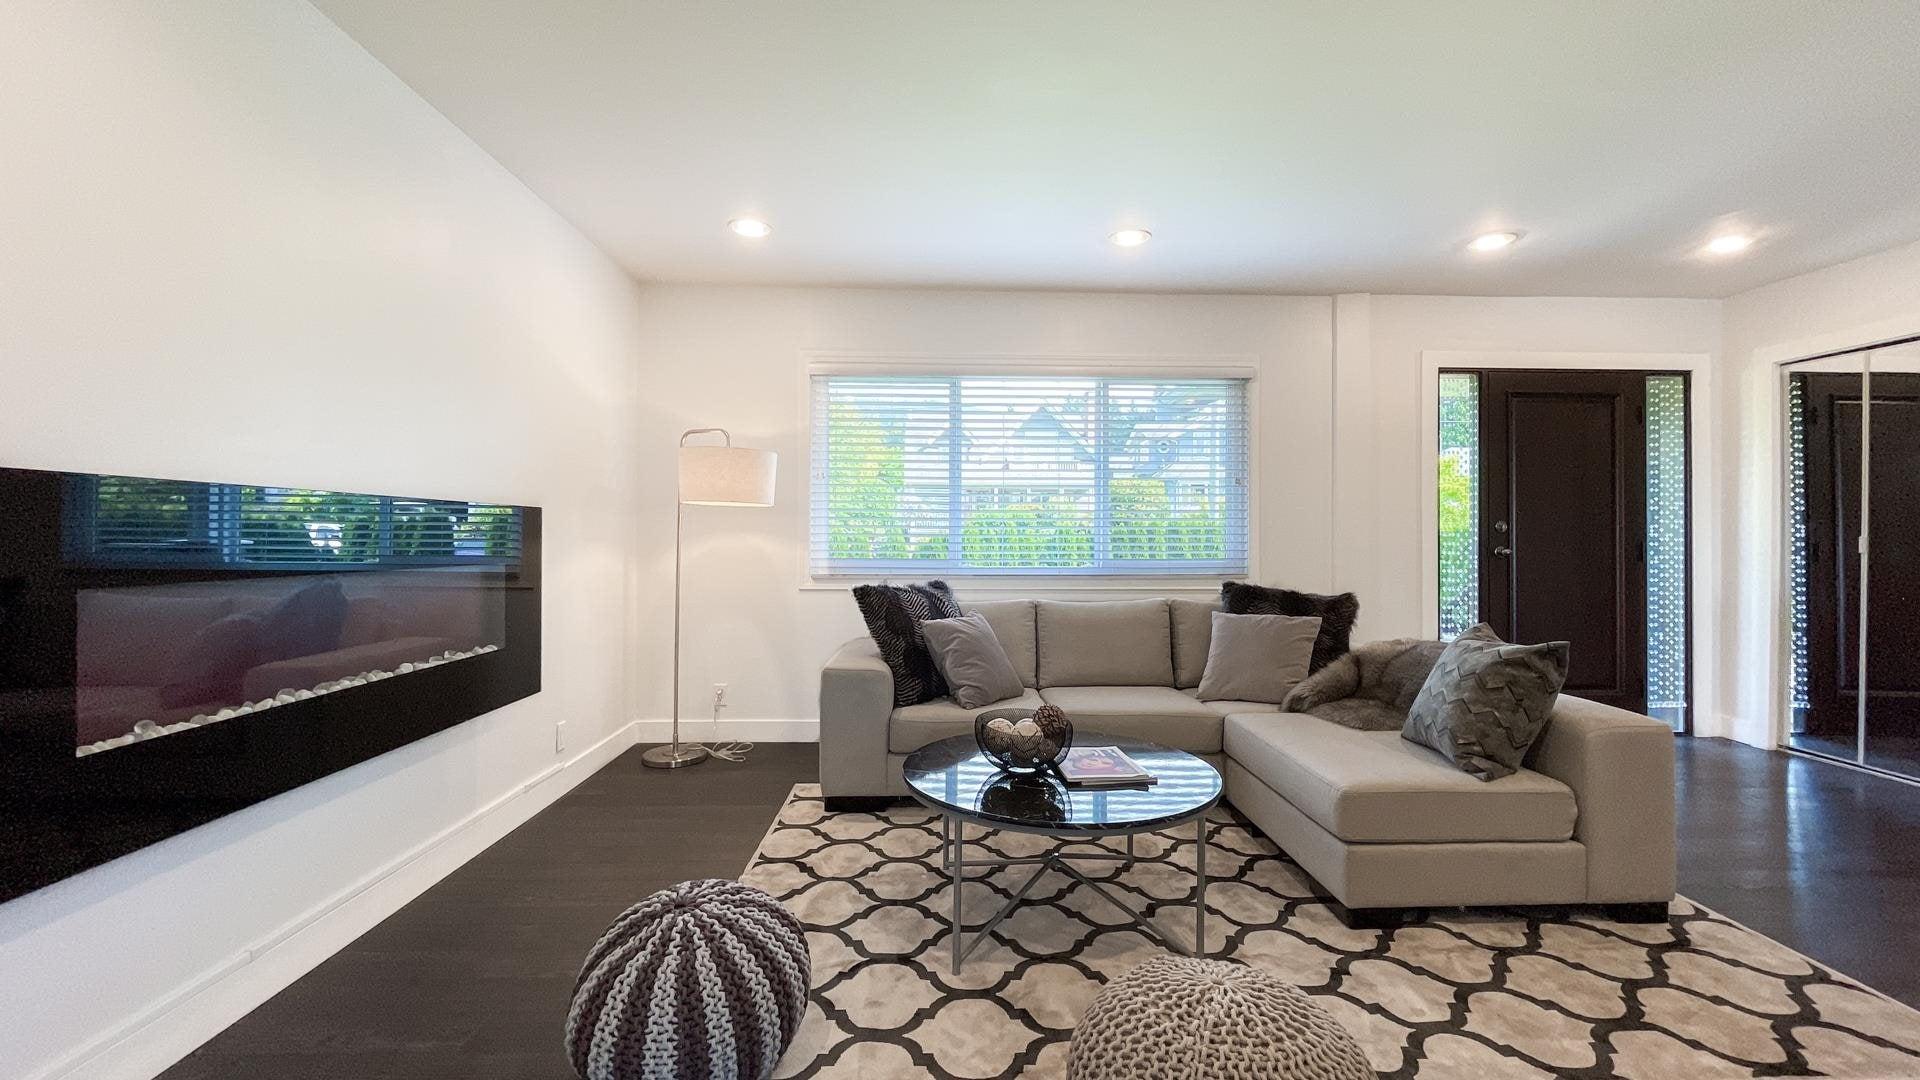 1168 JEFFERSON AVENUE - Ambleside House/Single Family for sale, 6 Bedrooms (R2602275) - #4